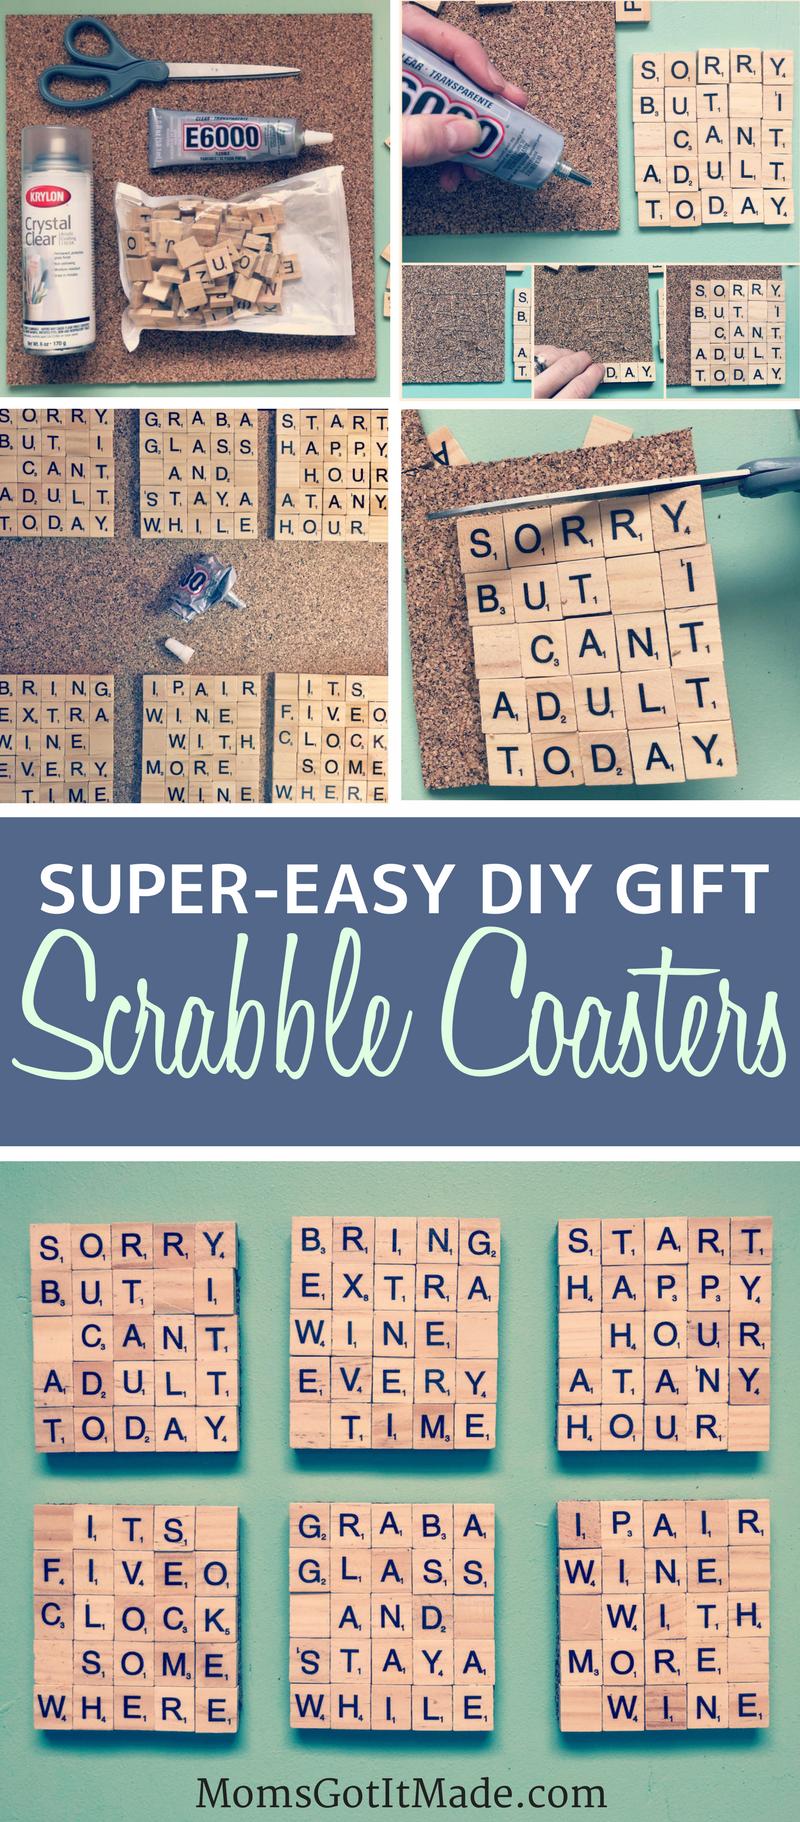 Easy DIY Scrabble Coaster Gift Mom's Got it Made